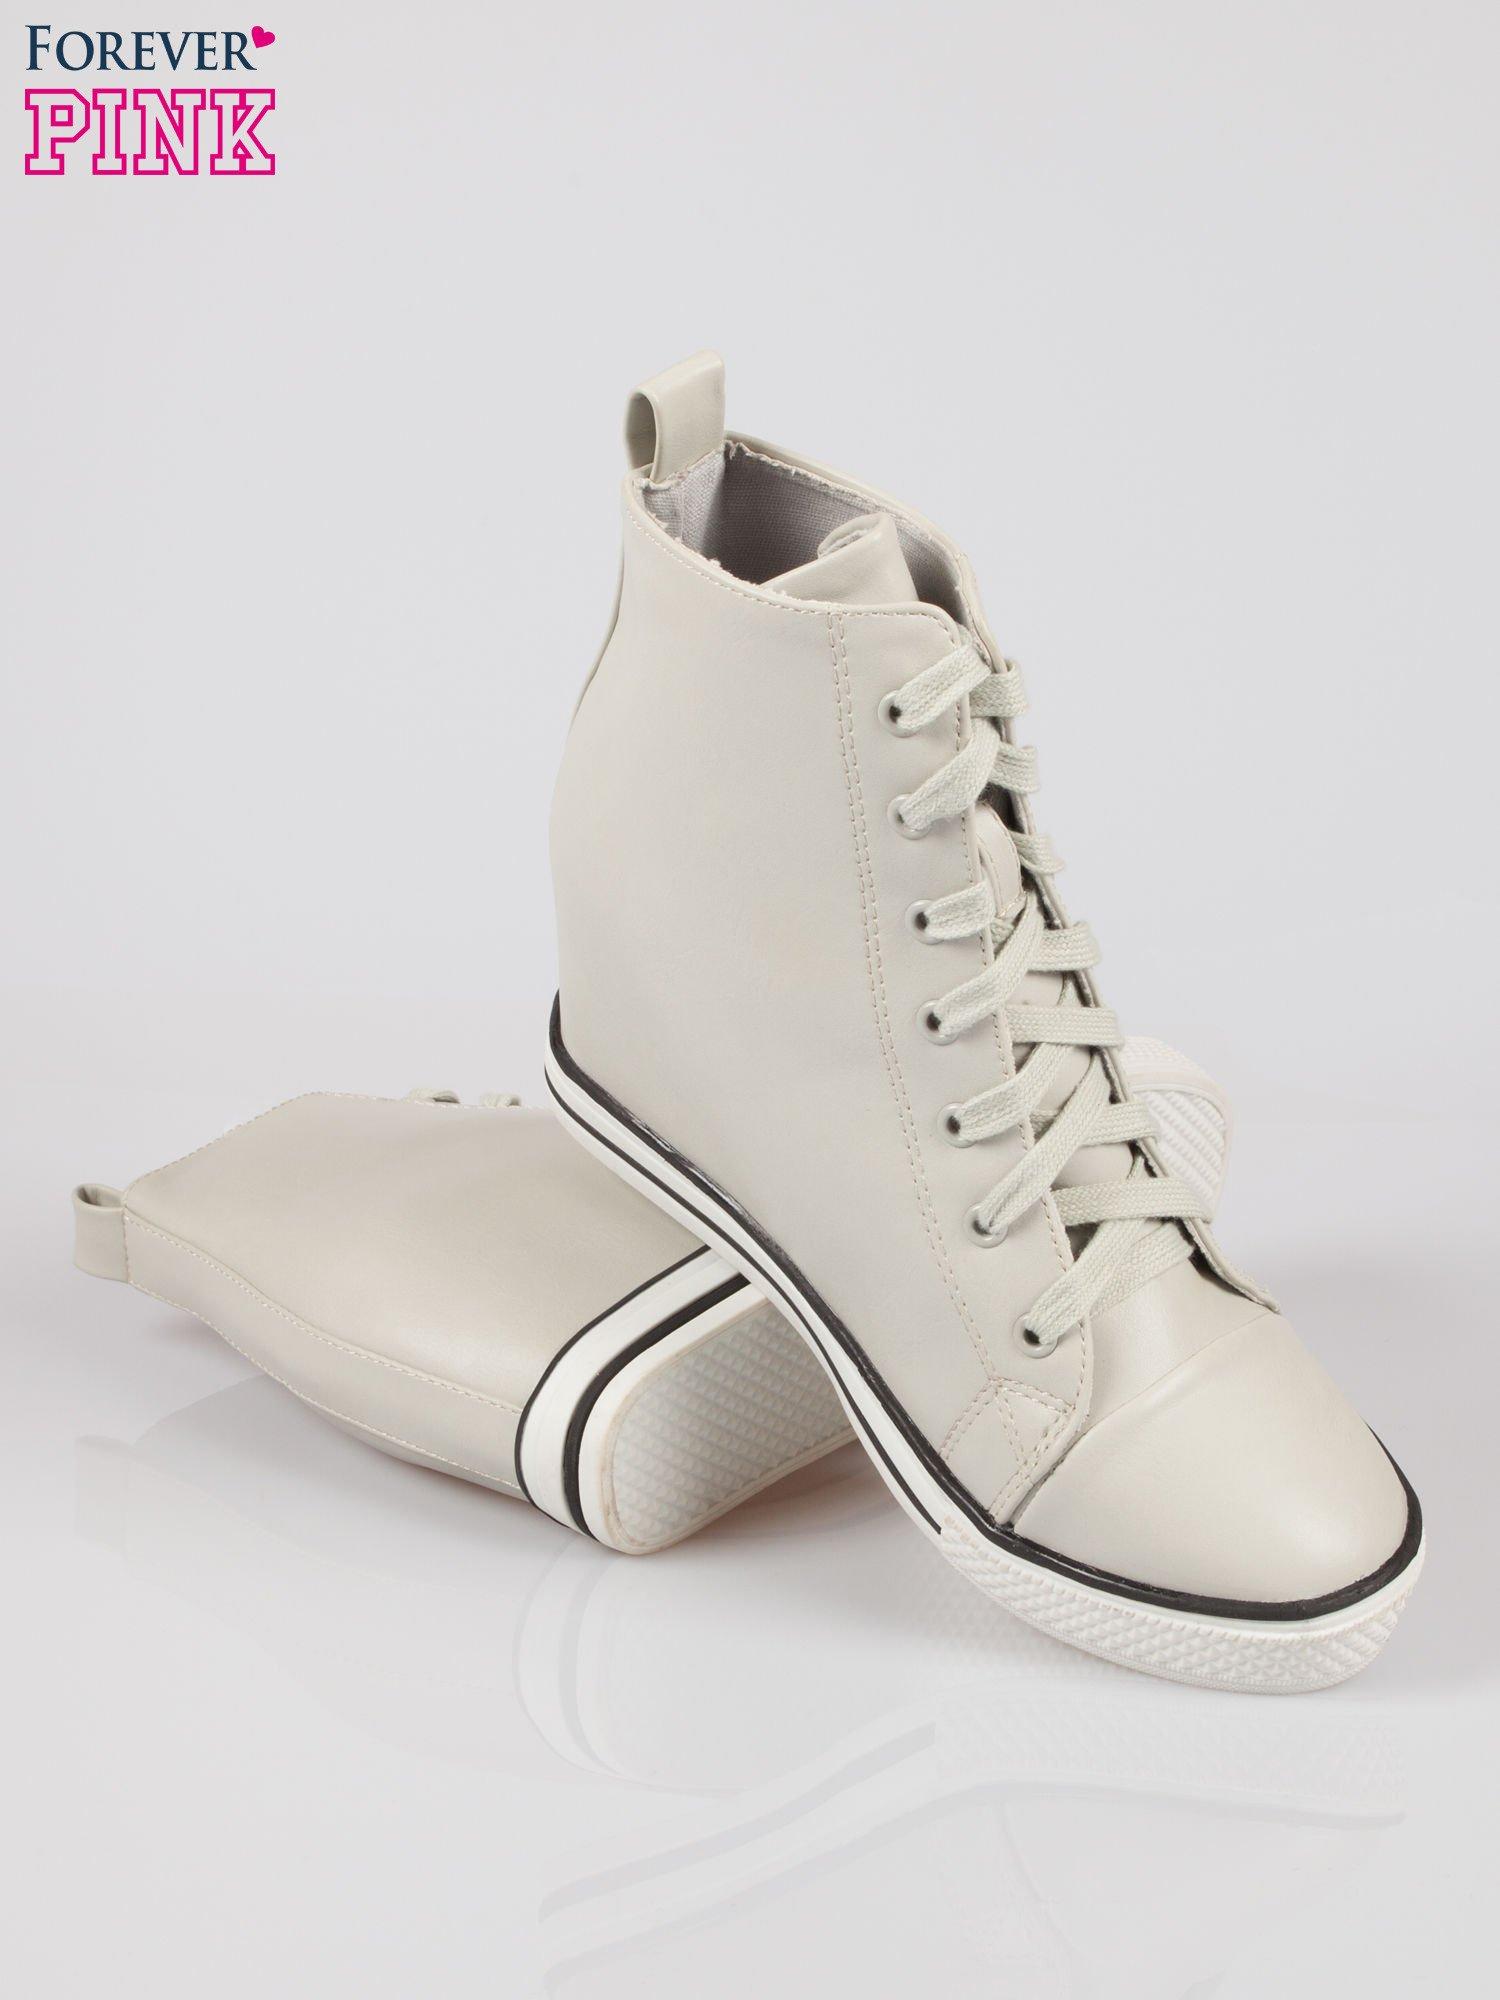 Szare skórzane sneakersy damskie                                  zdj.                                  4